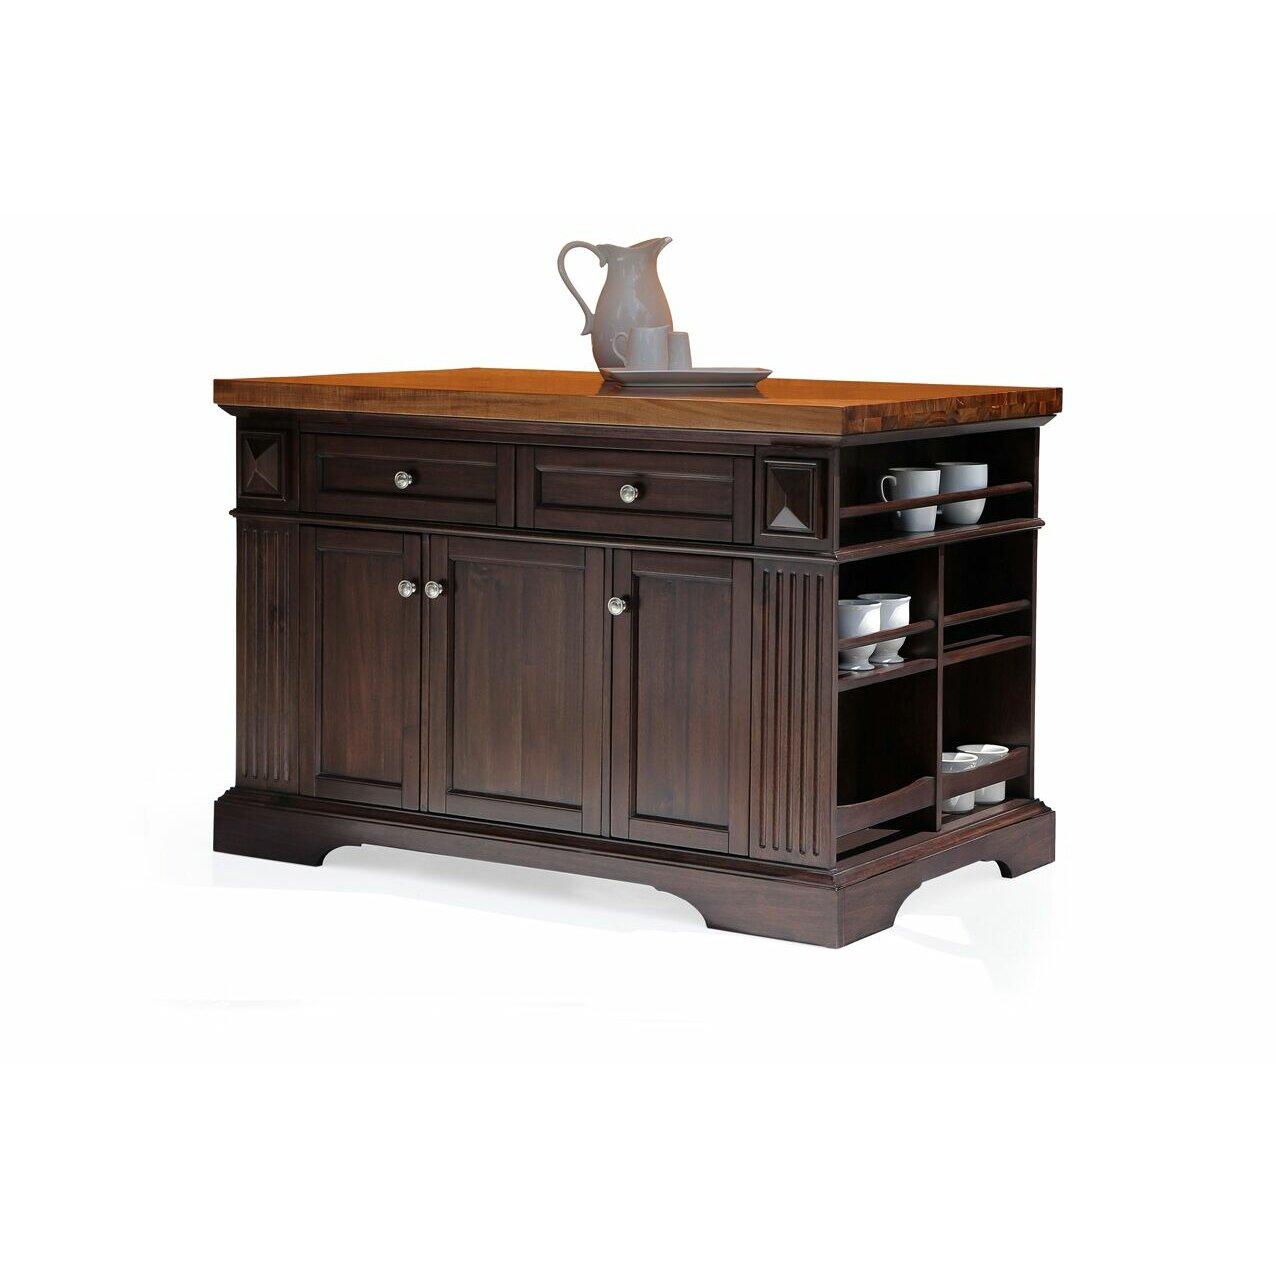 222 Fifth Furniture Greenwich Kitchen Island With Wood Top Wayfair